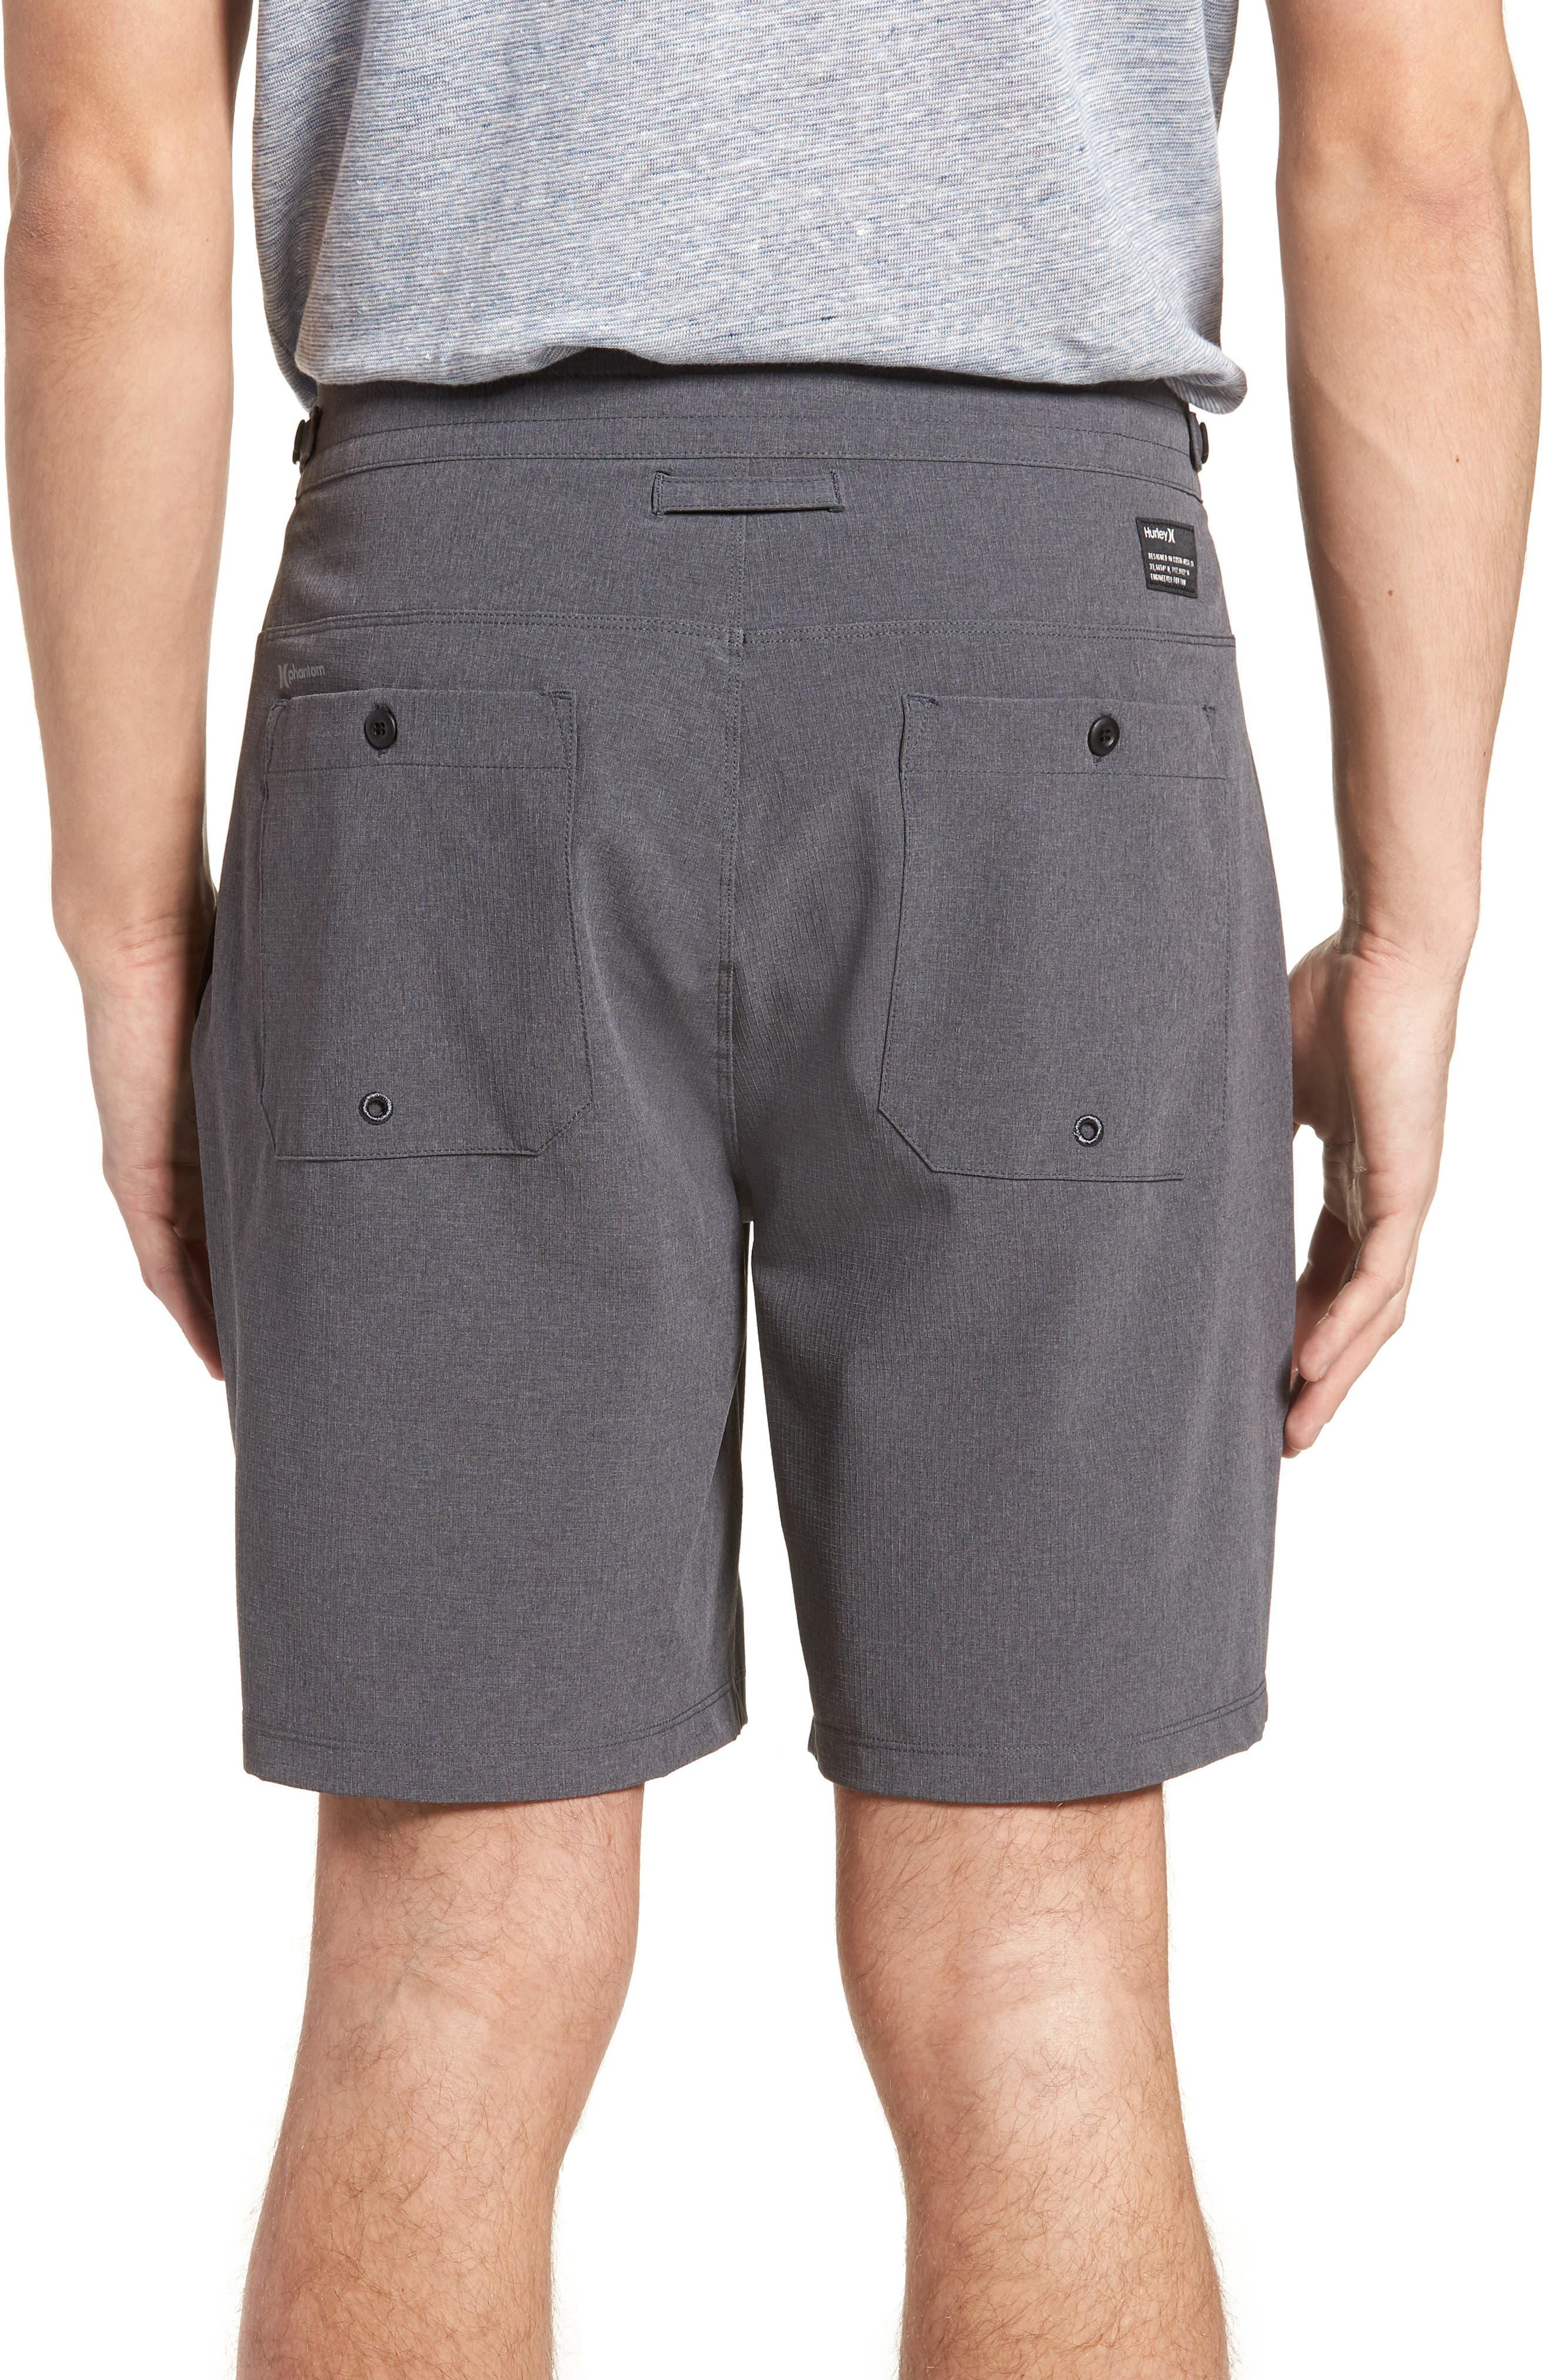 Phantom Coastline Shorts,                             Alternate thumbnail 2, color,                             Black Heather